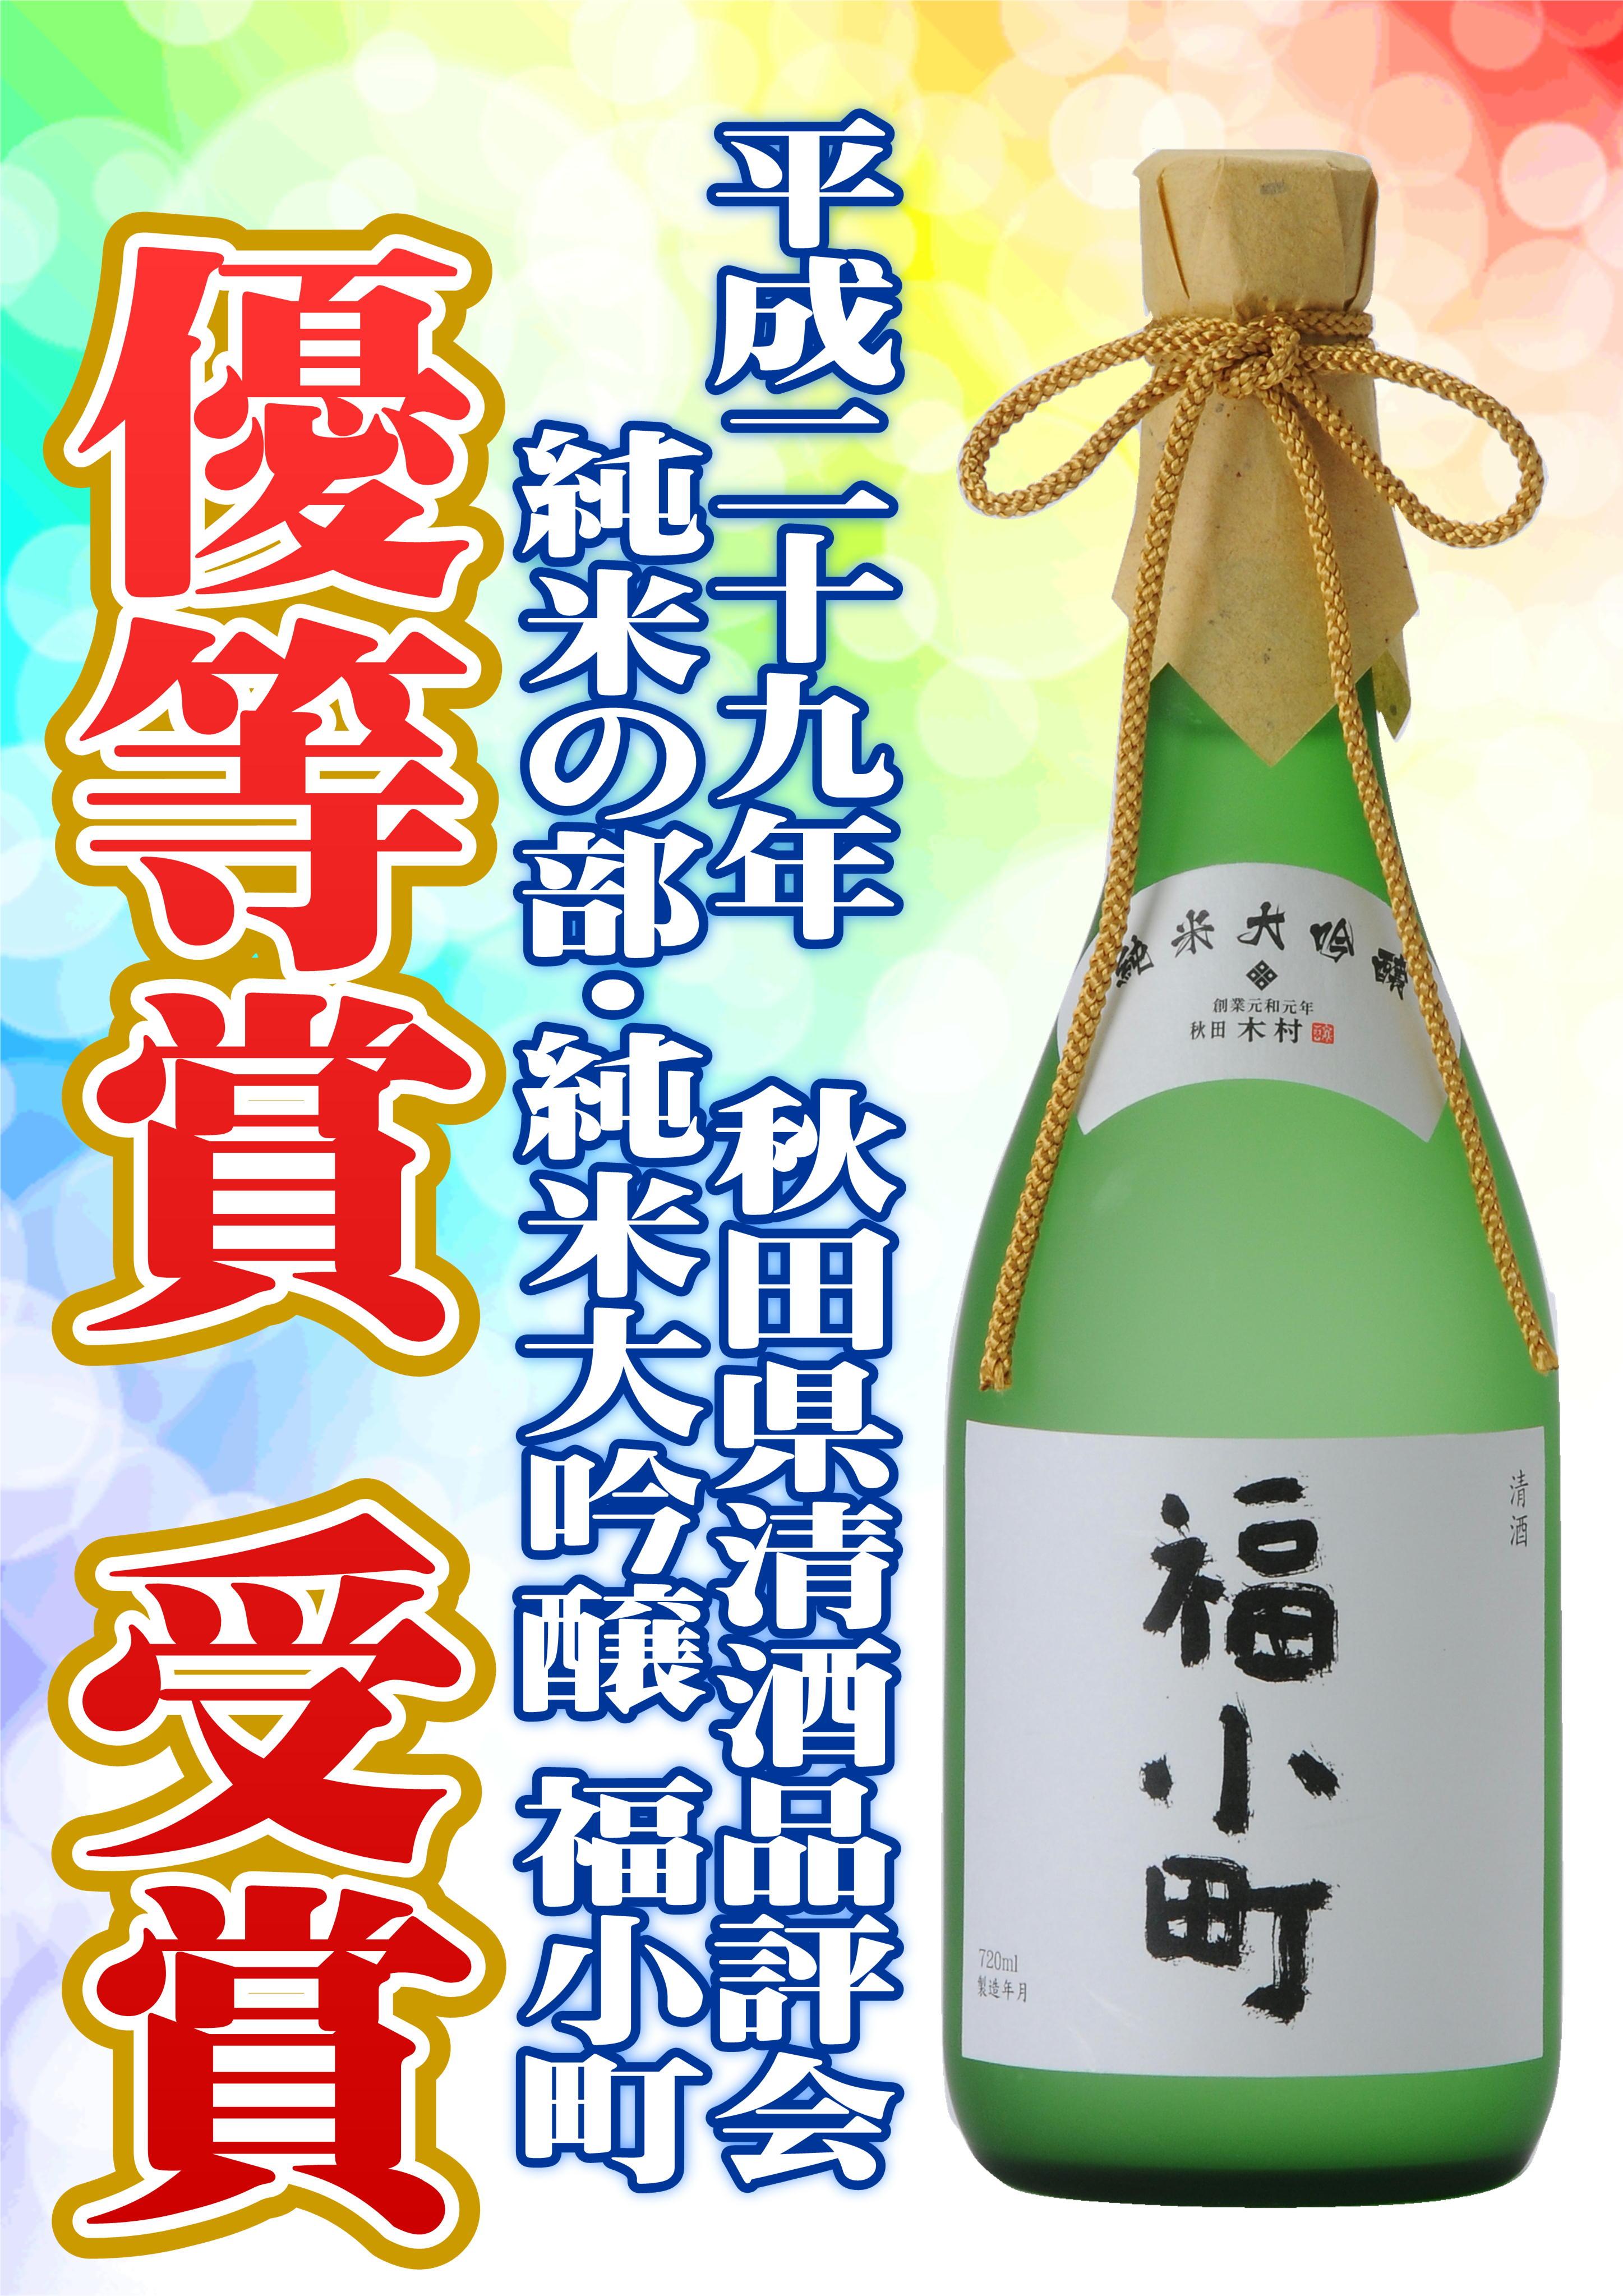 http://www.fukukomachi.com/blog/photo/20171102-2.JPG